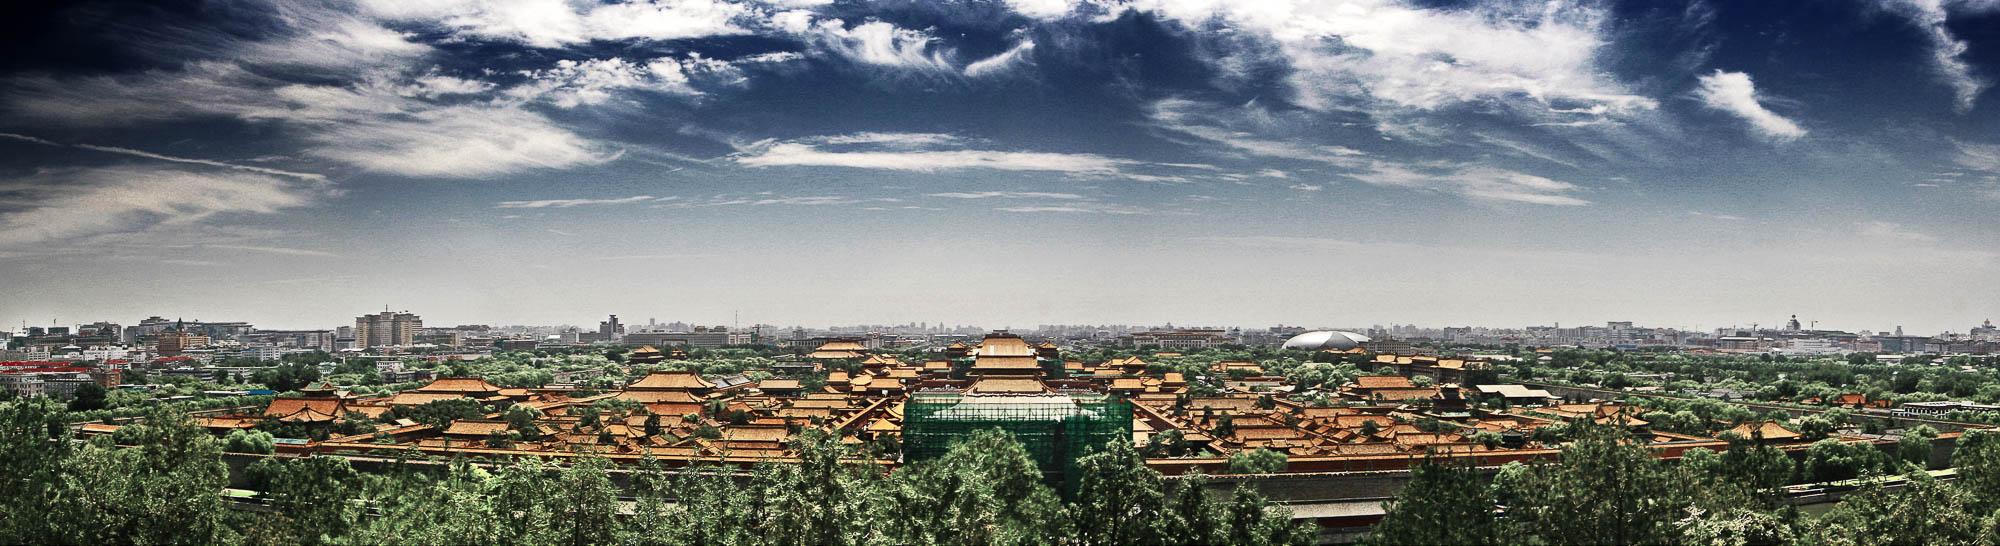 CHINA_Panoramas_jusmedic - 1